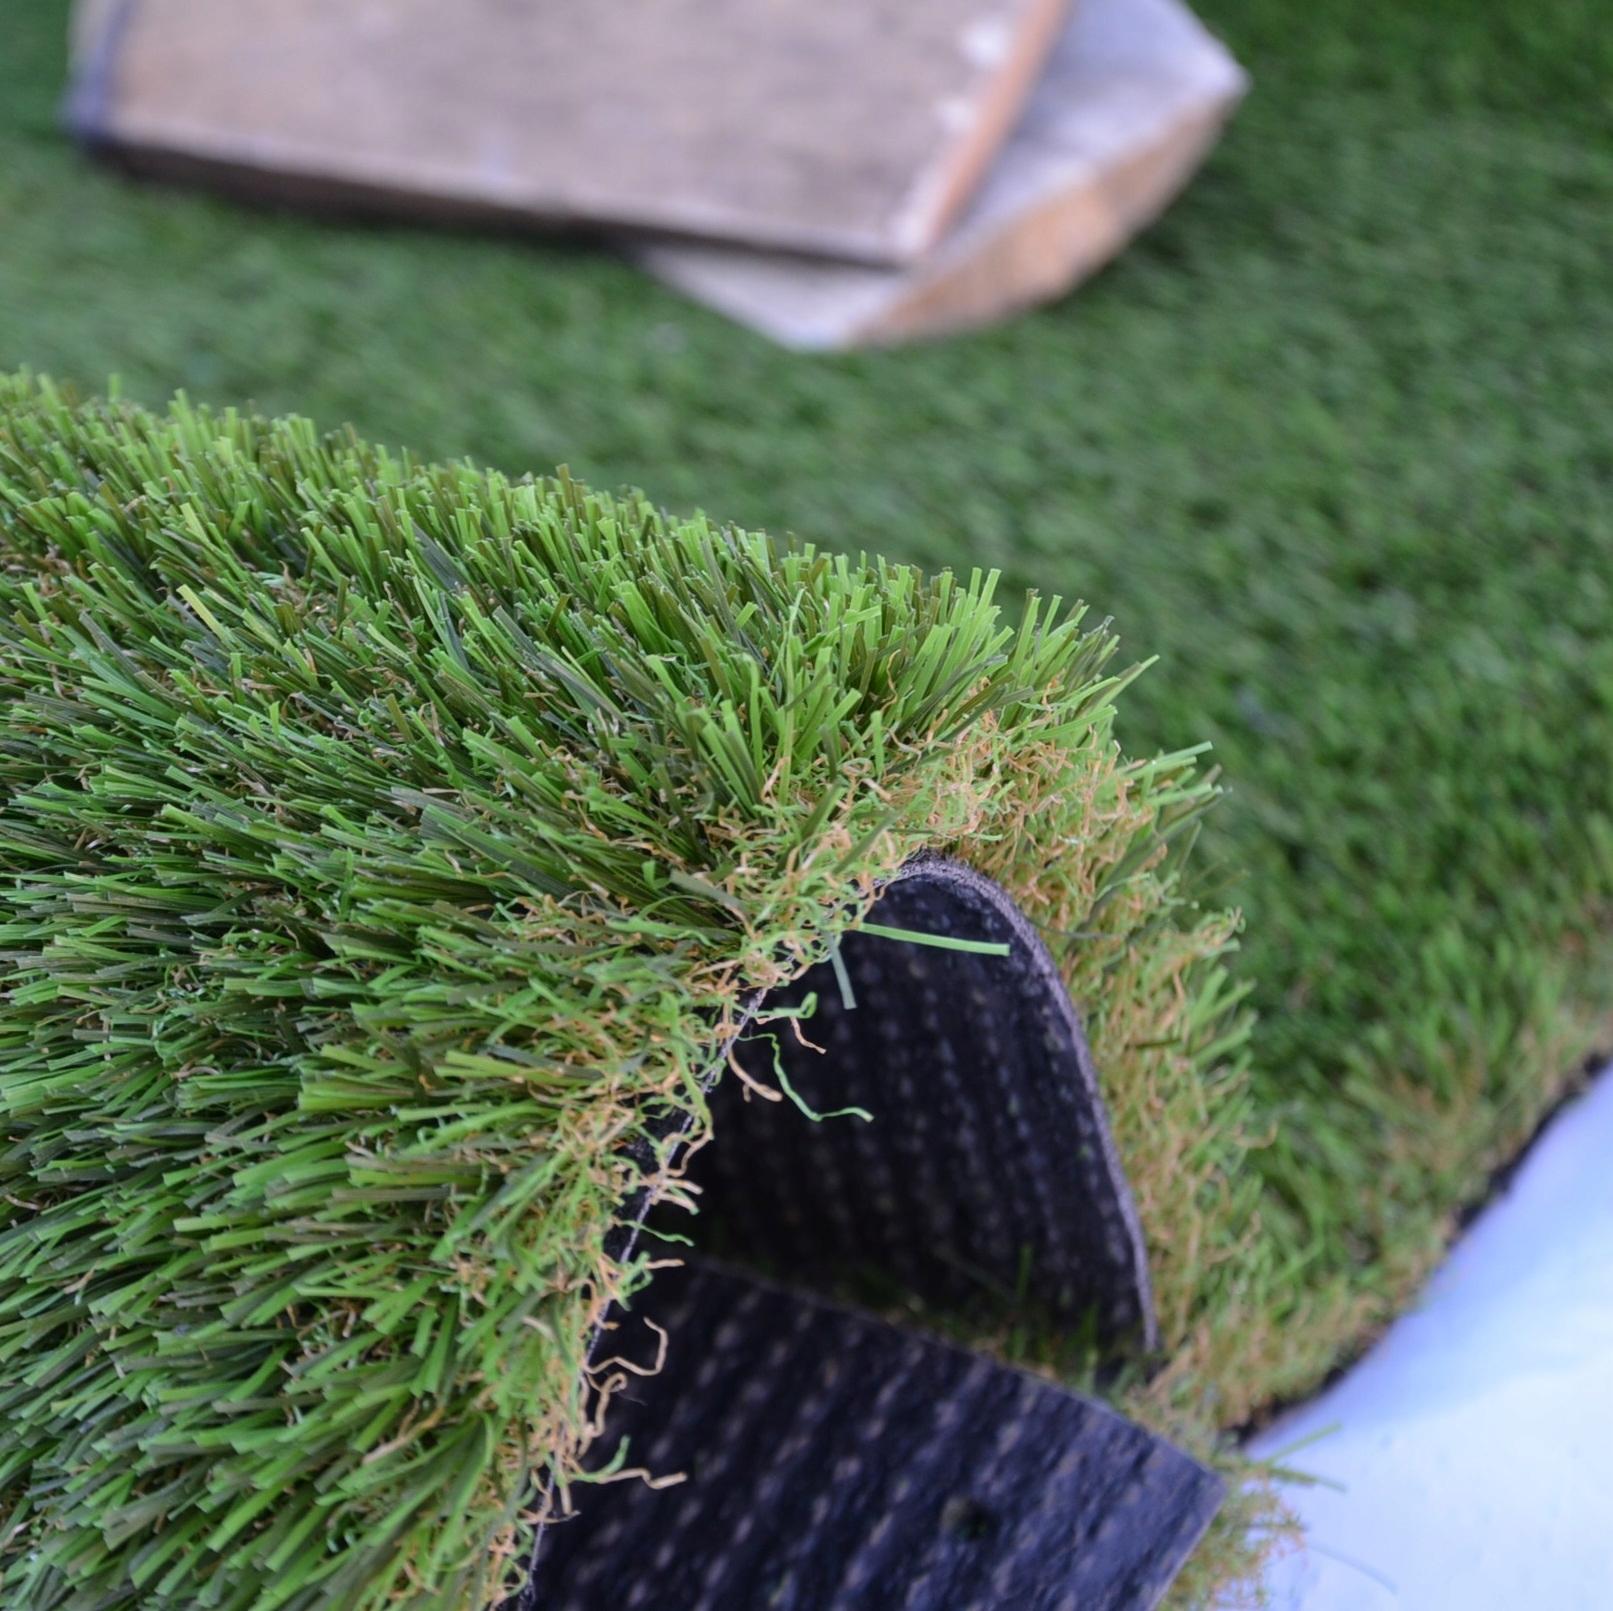 Koberec Umelá tráva CABANA| hrubé| 40 mm| záhrada|200x900